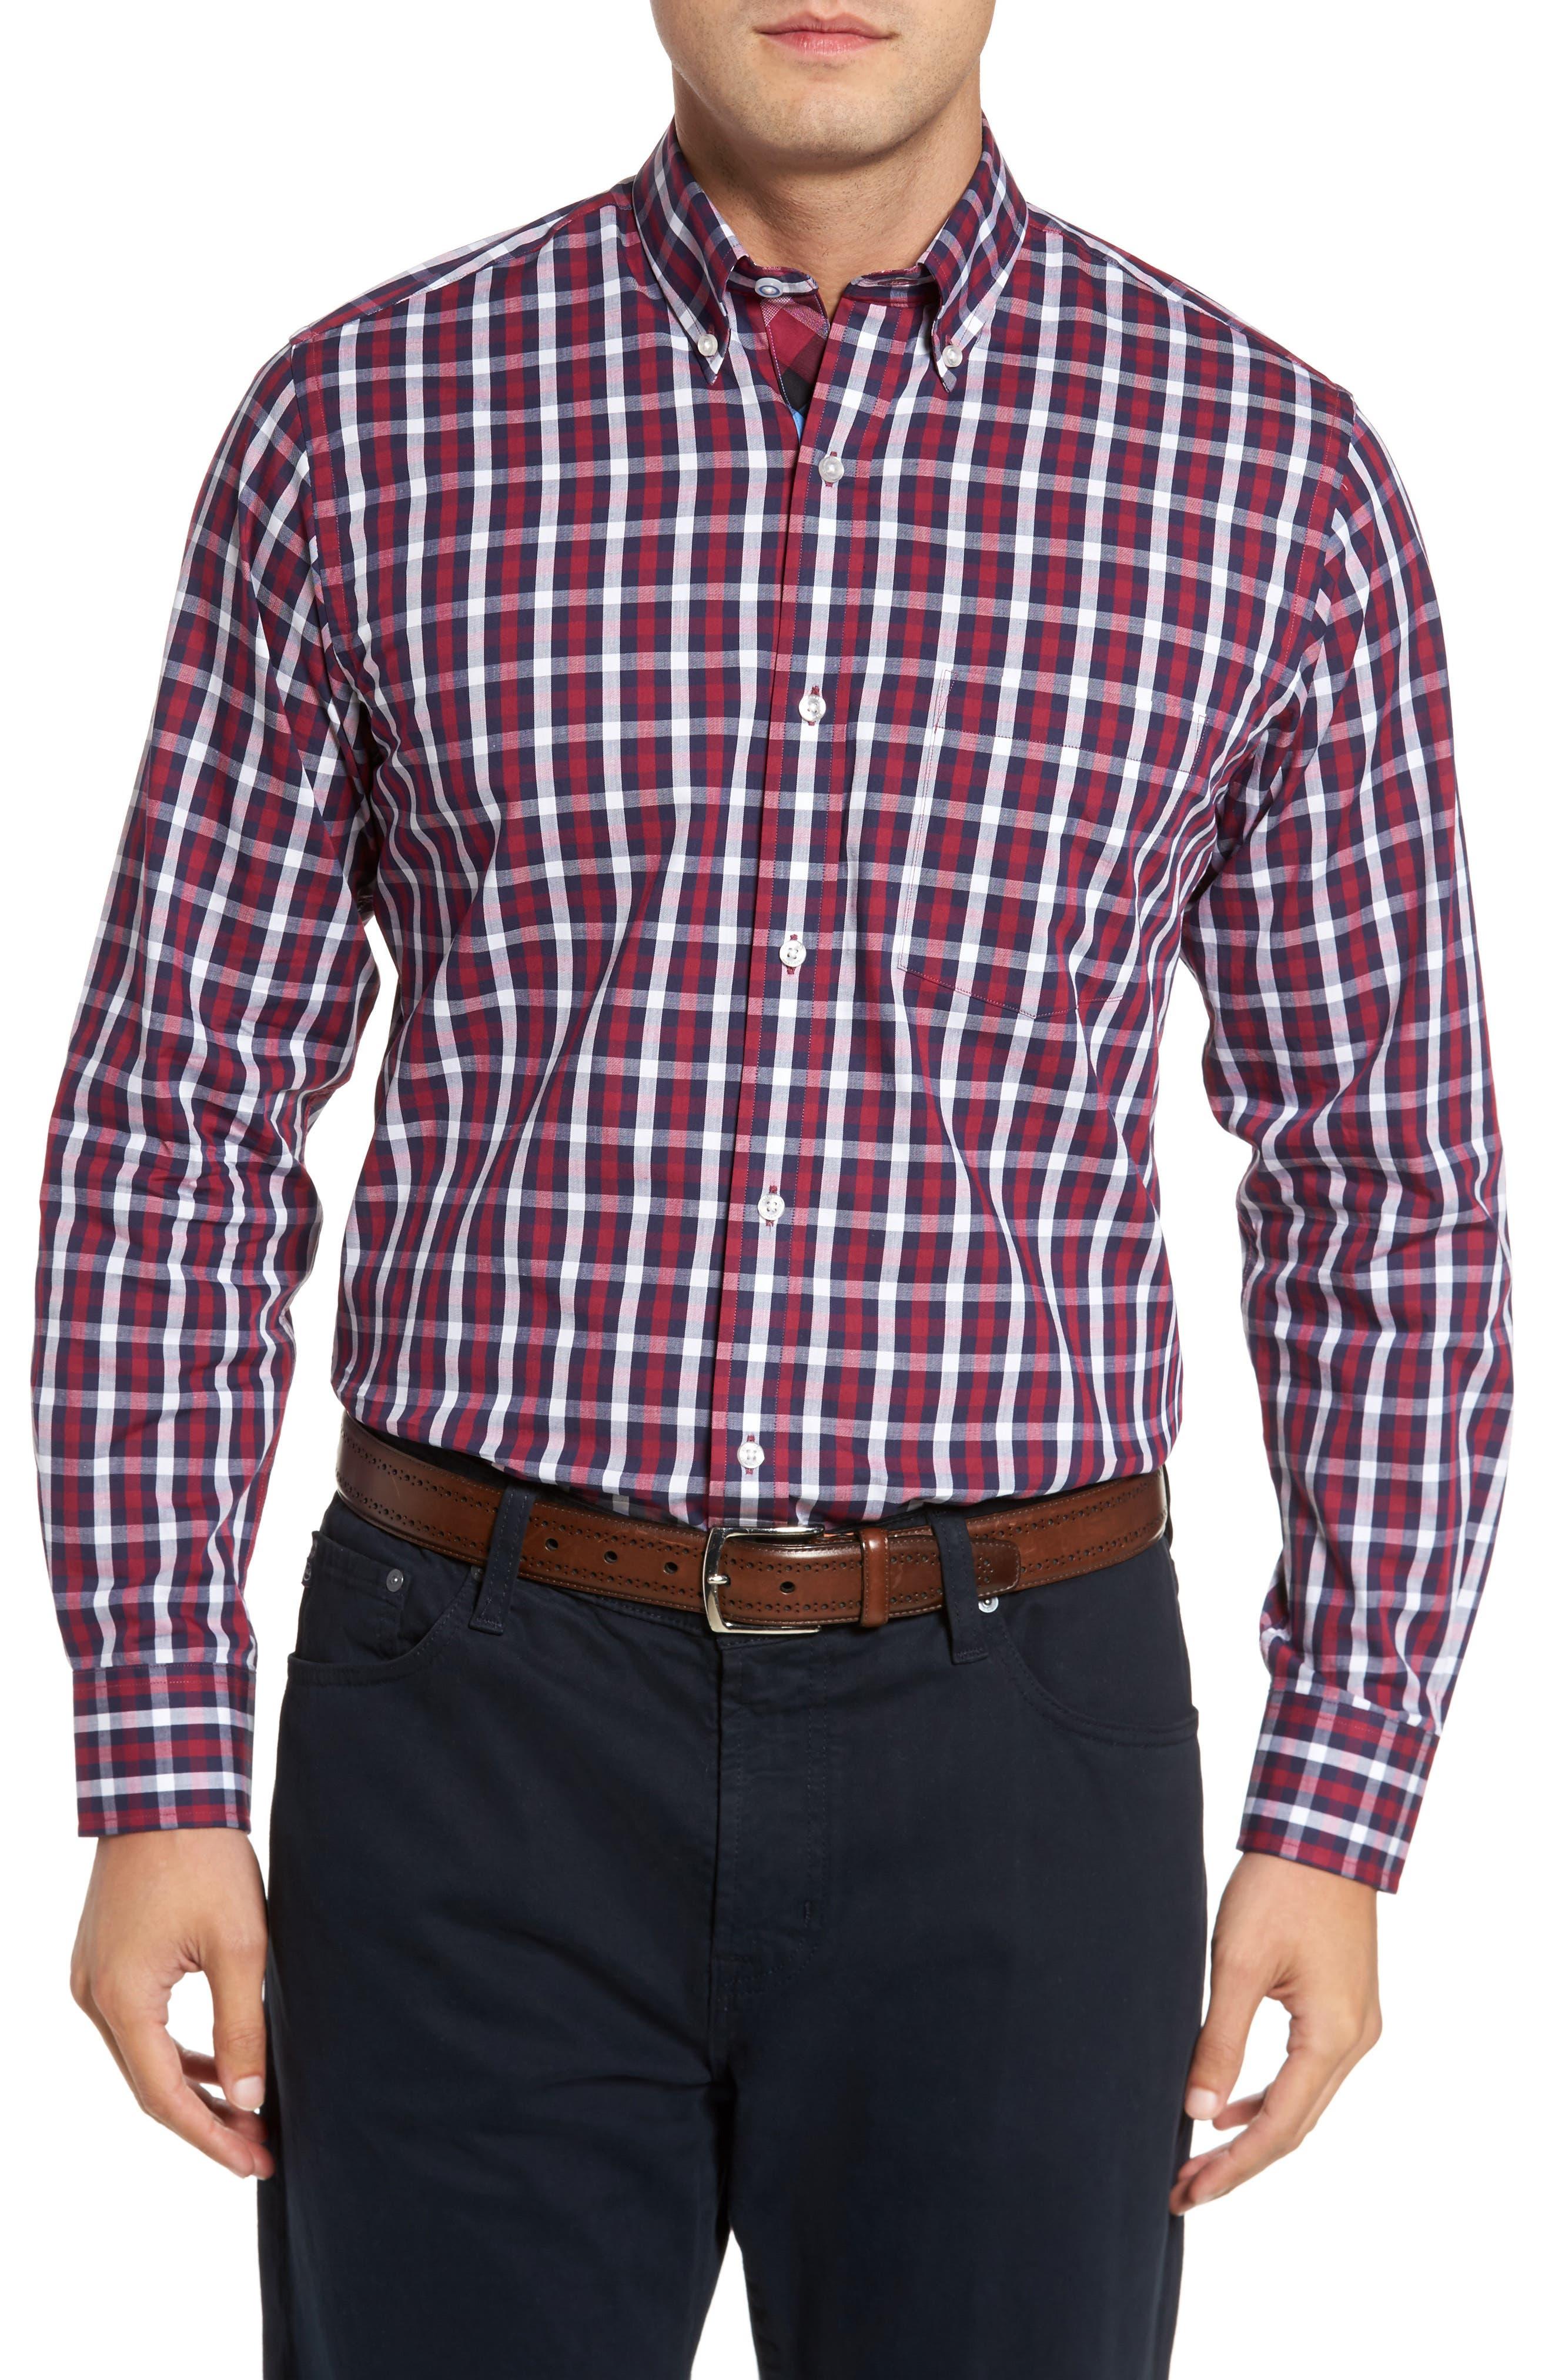 Alternate Image 1 Selected - TailorByrd Covington Check Sport Shirt